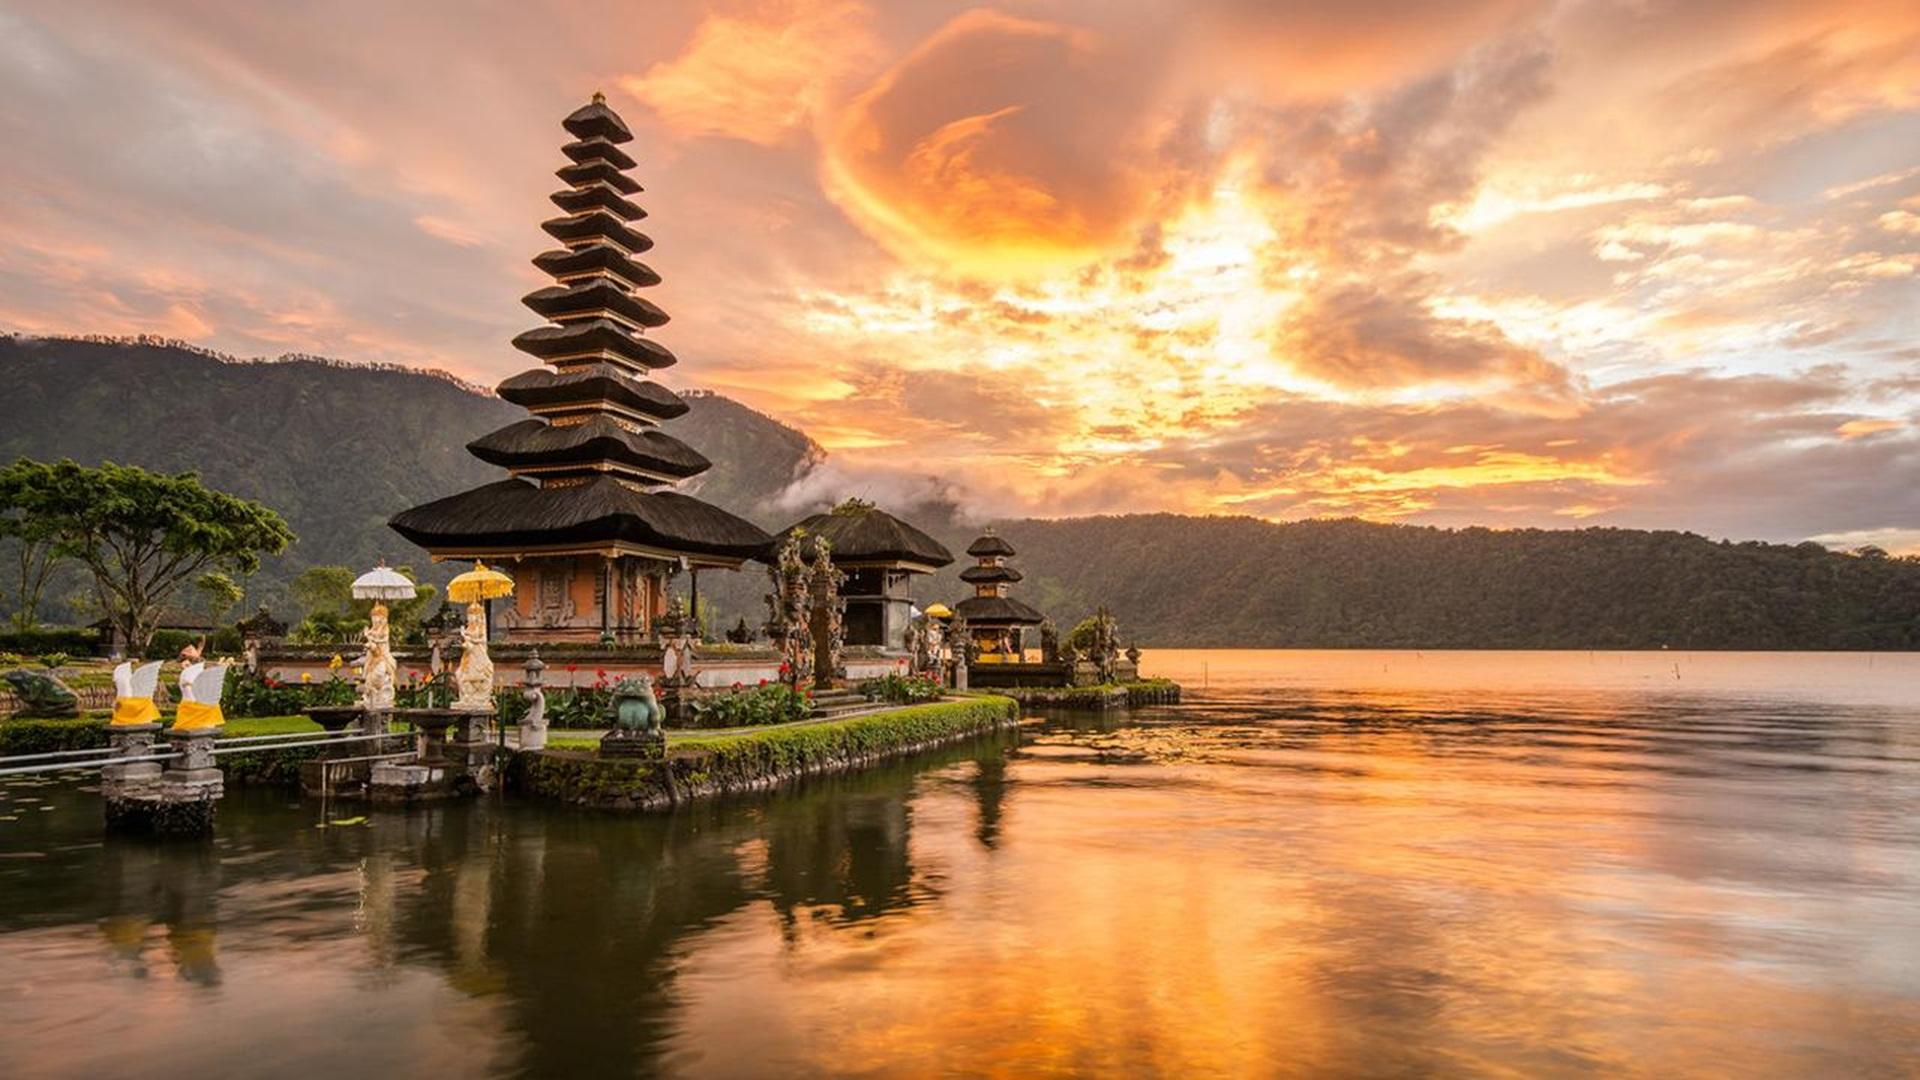 Wisata Bali Yang Paling Hits Dan Instagramable Sumoqq Lounge